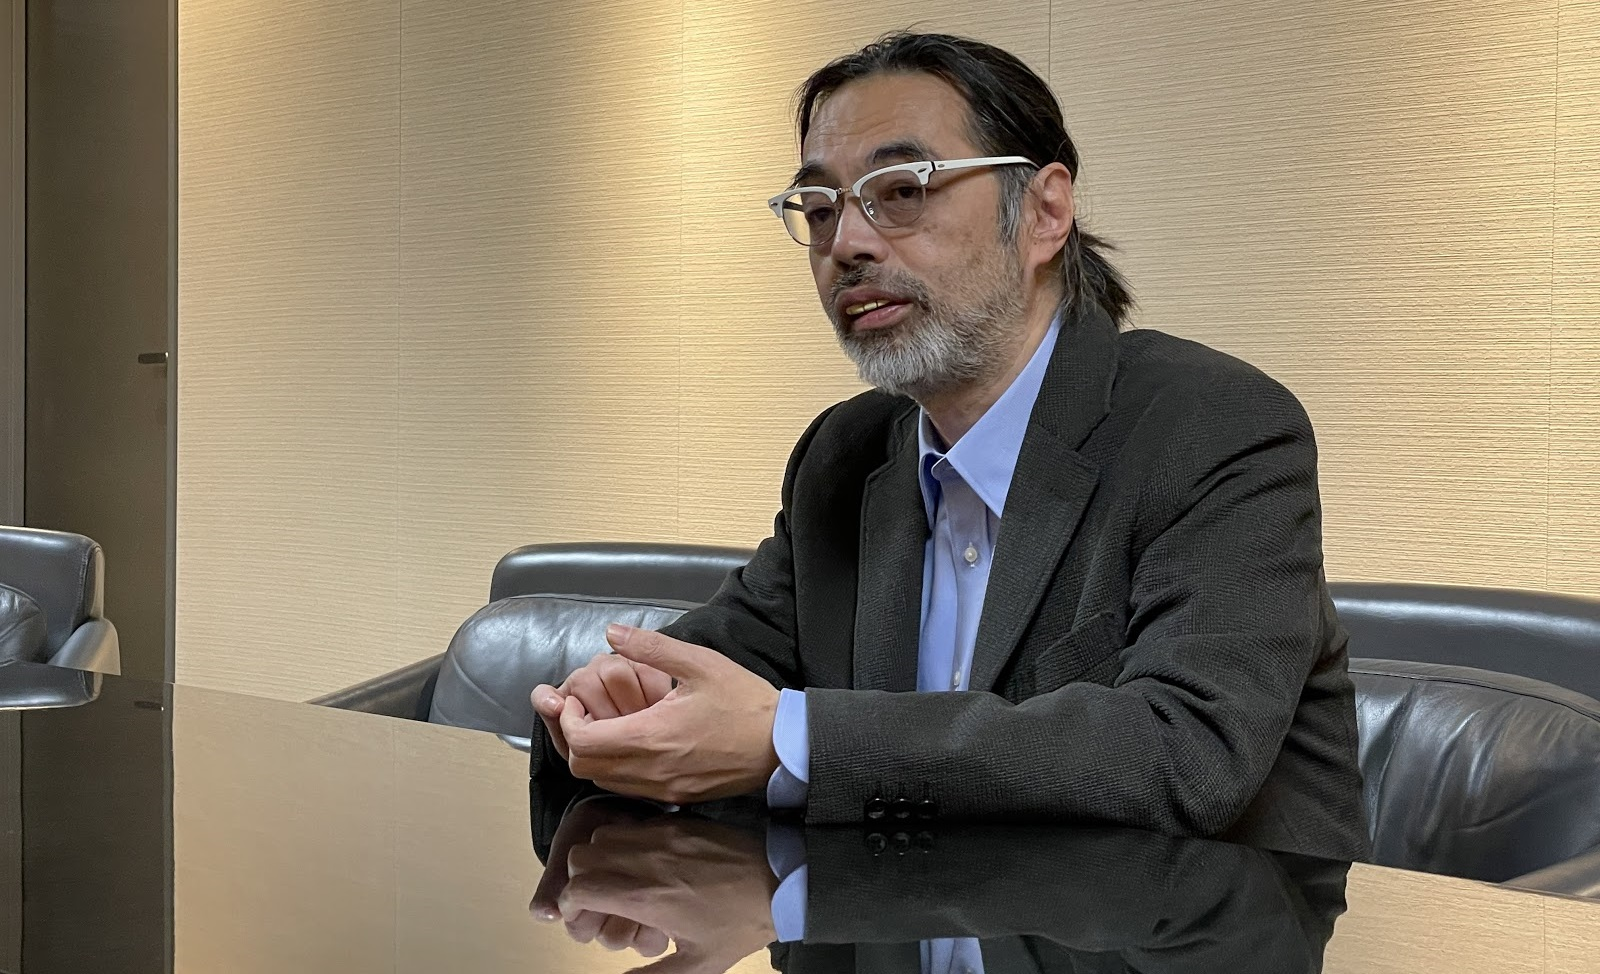 Takaya Imamura, Majora's Mask Art Director and Creator of Tingle, Reflects on Working with the Zelda Series